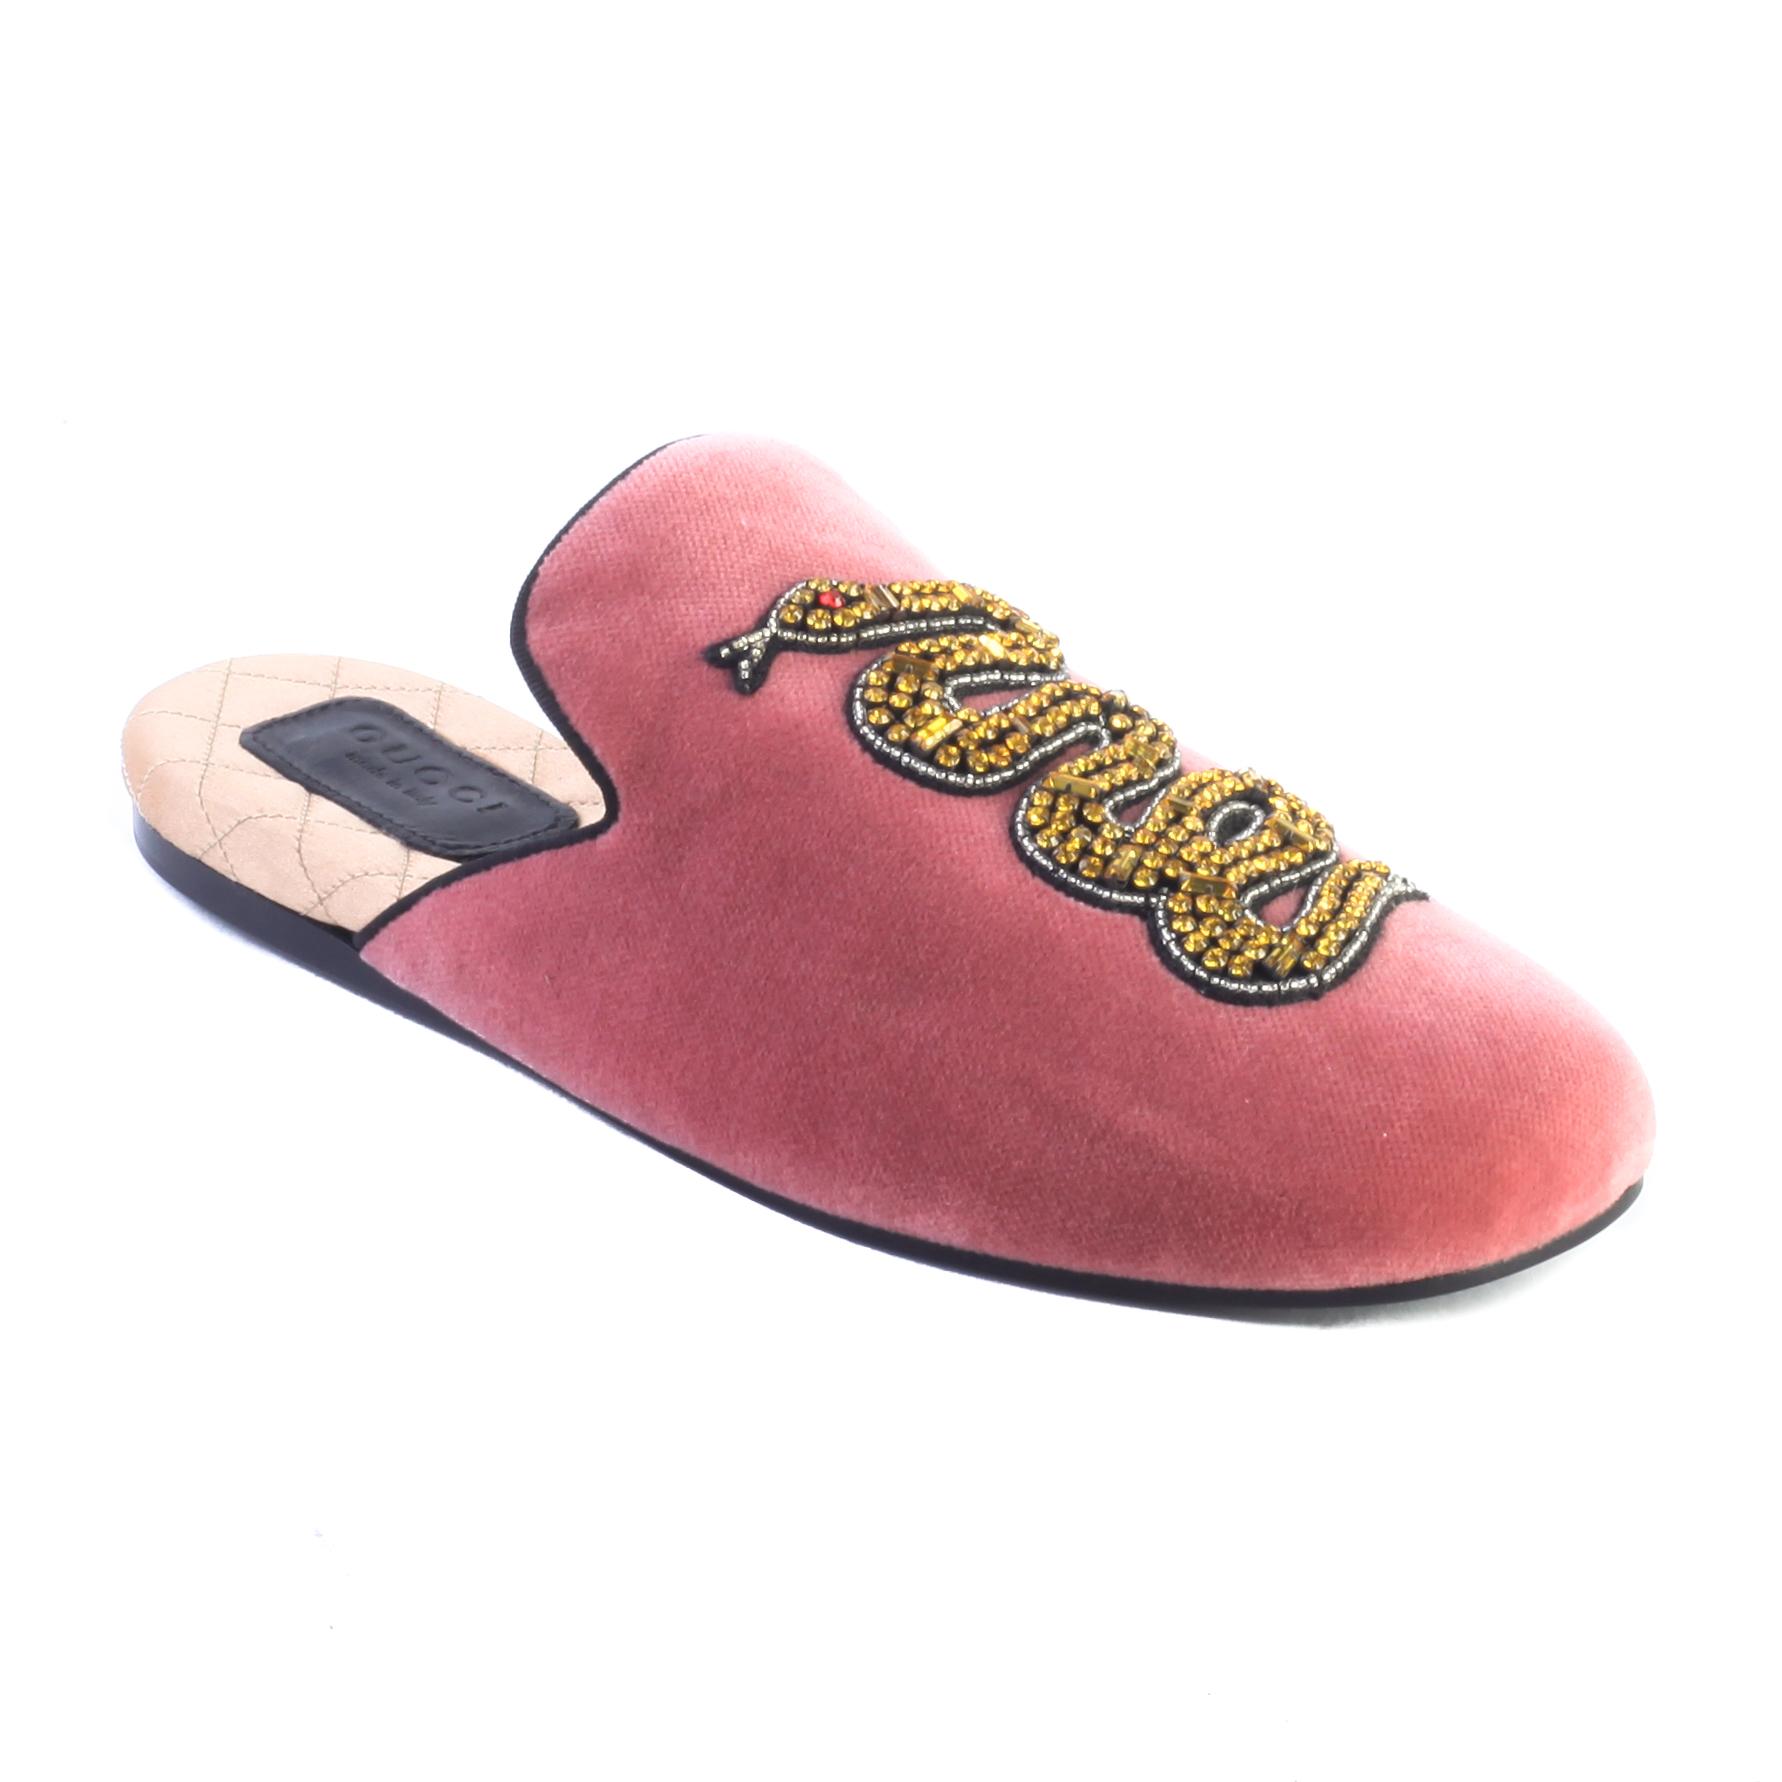 Details about Gucci Women s Lawrence Princetown Mule Velvet Snake Sandal  Shoes Pink 418494948